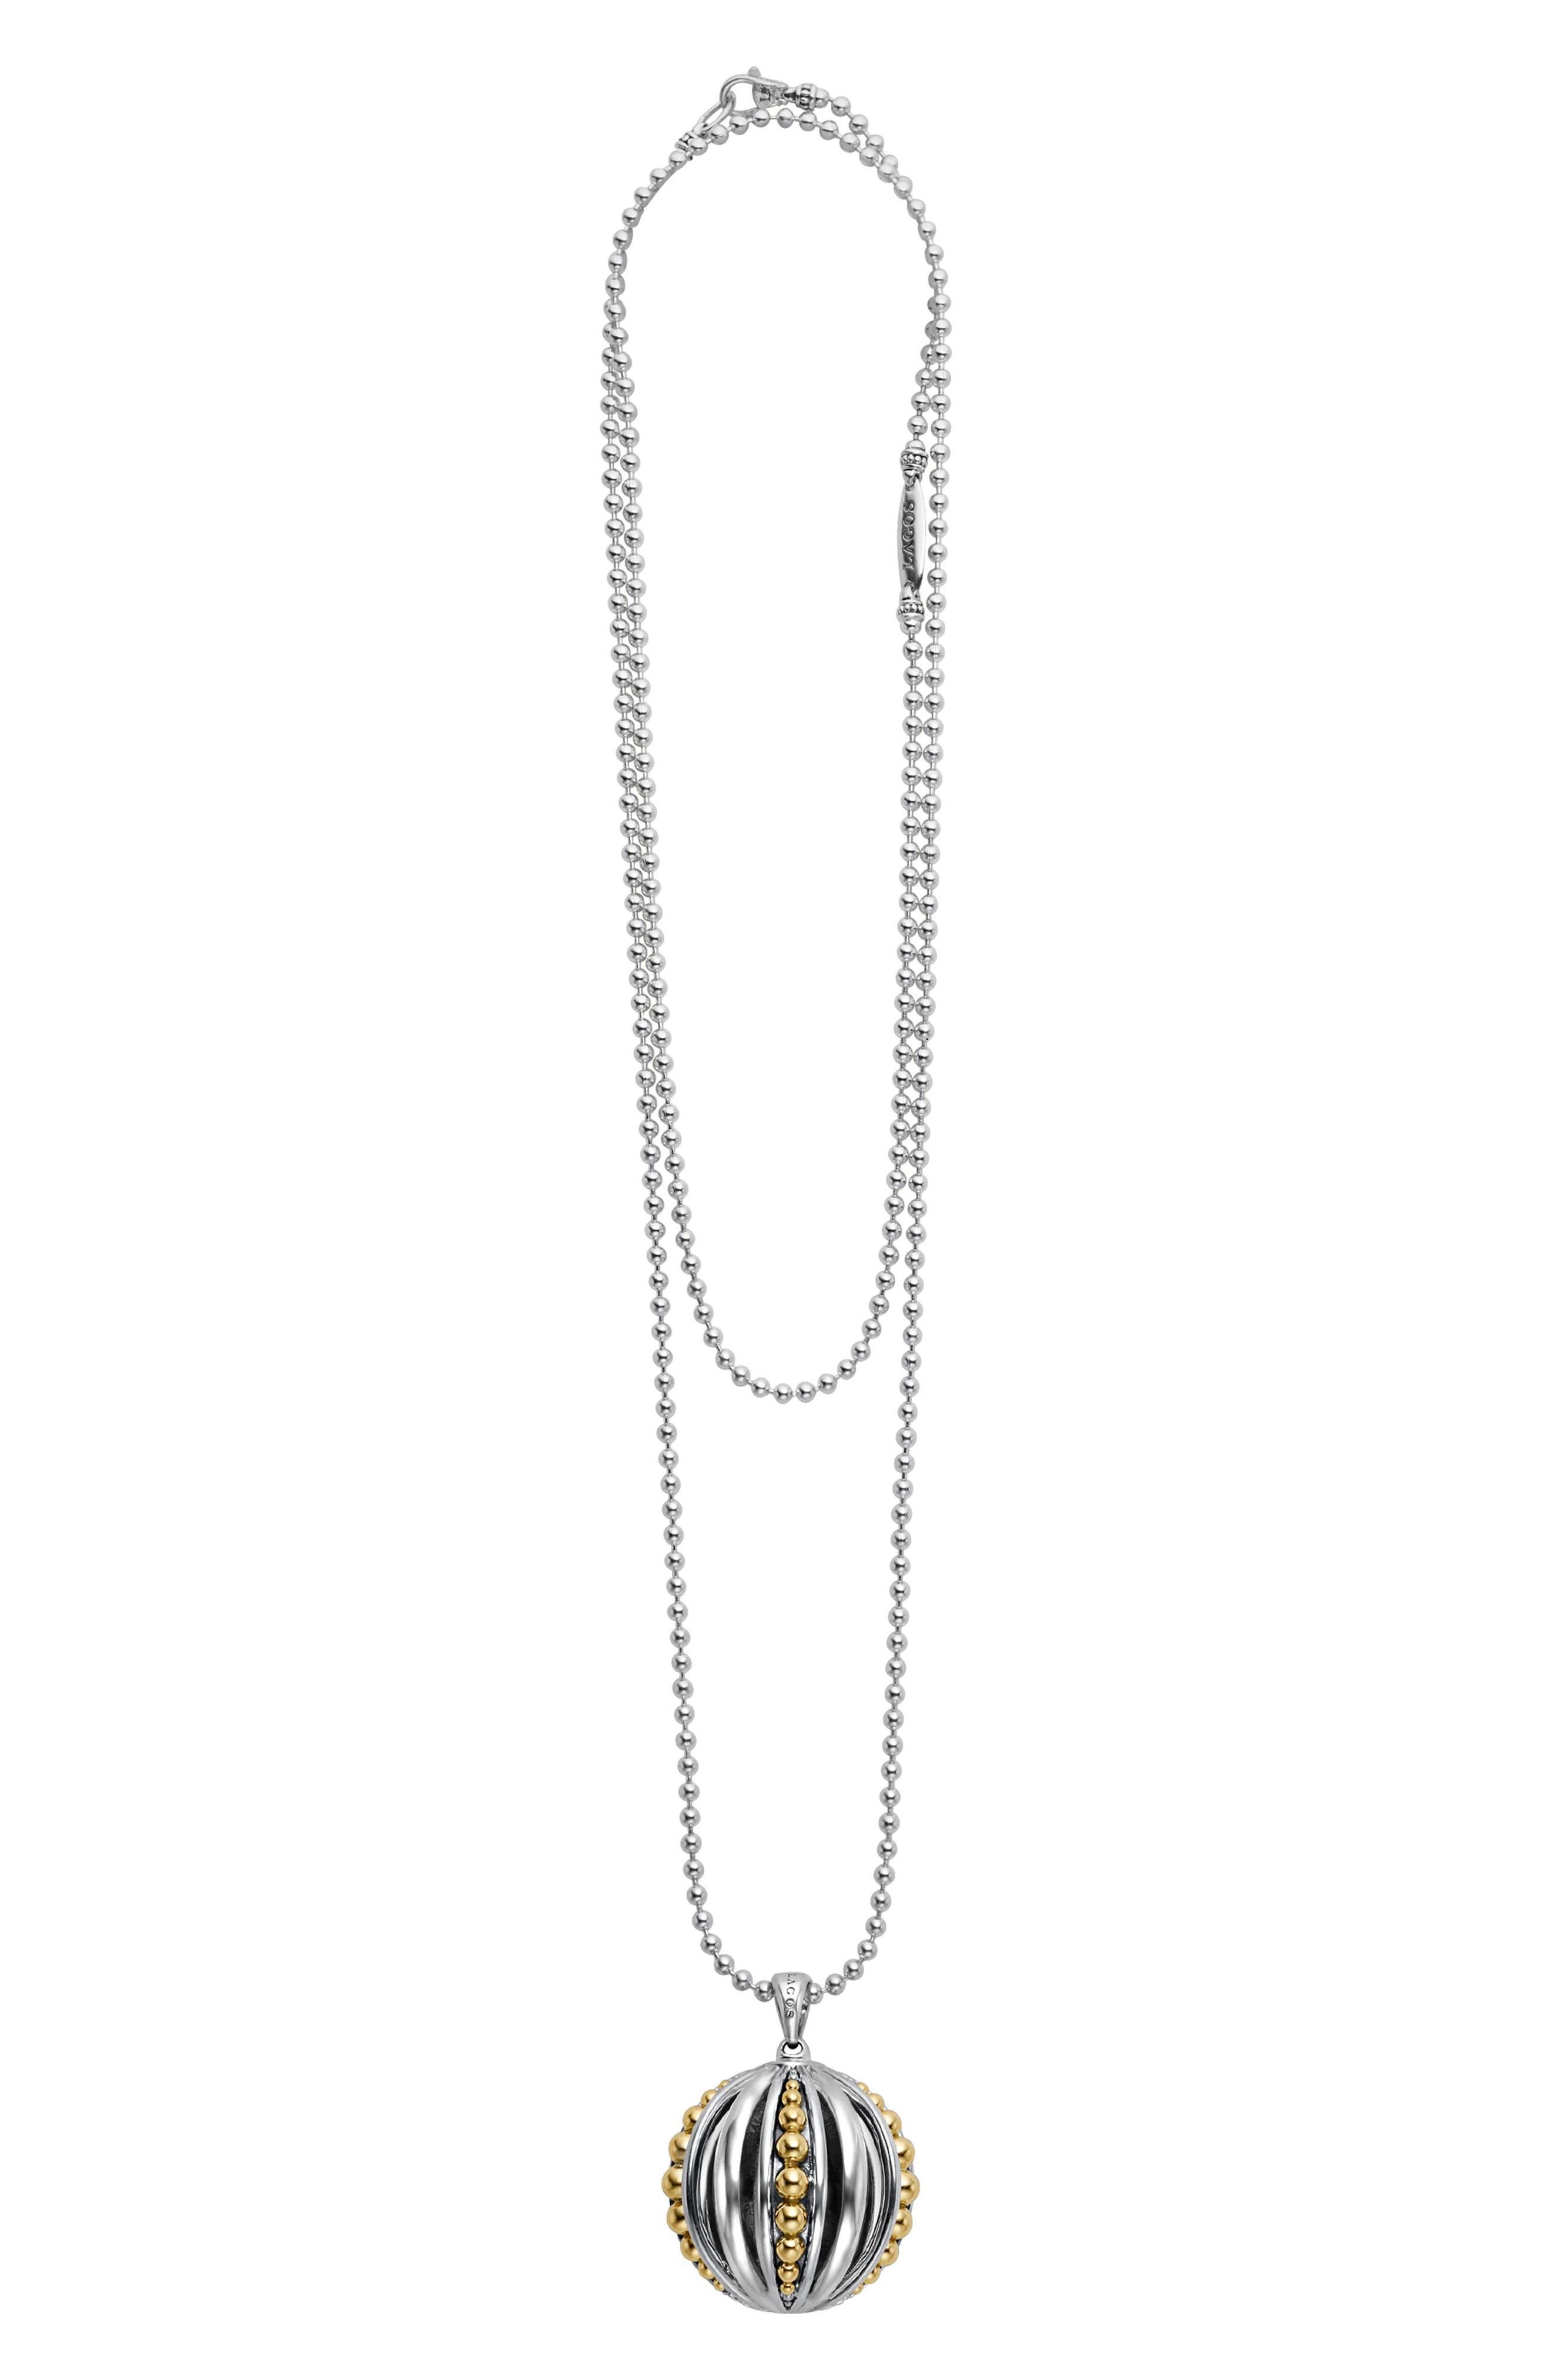 Caviar Talisman Beaded Cage Ball Pendant Necklace,                         Main,                         color, SILVER/ 18K GOLD